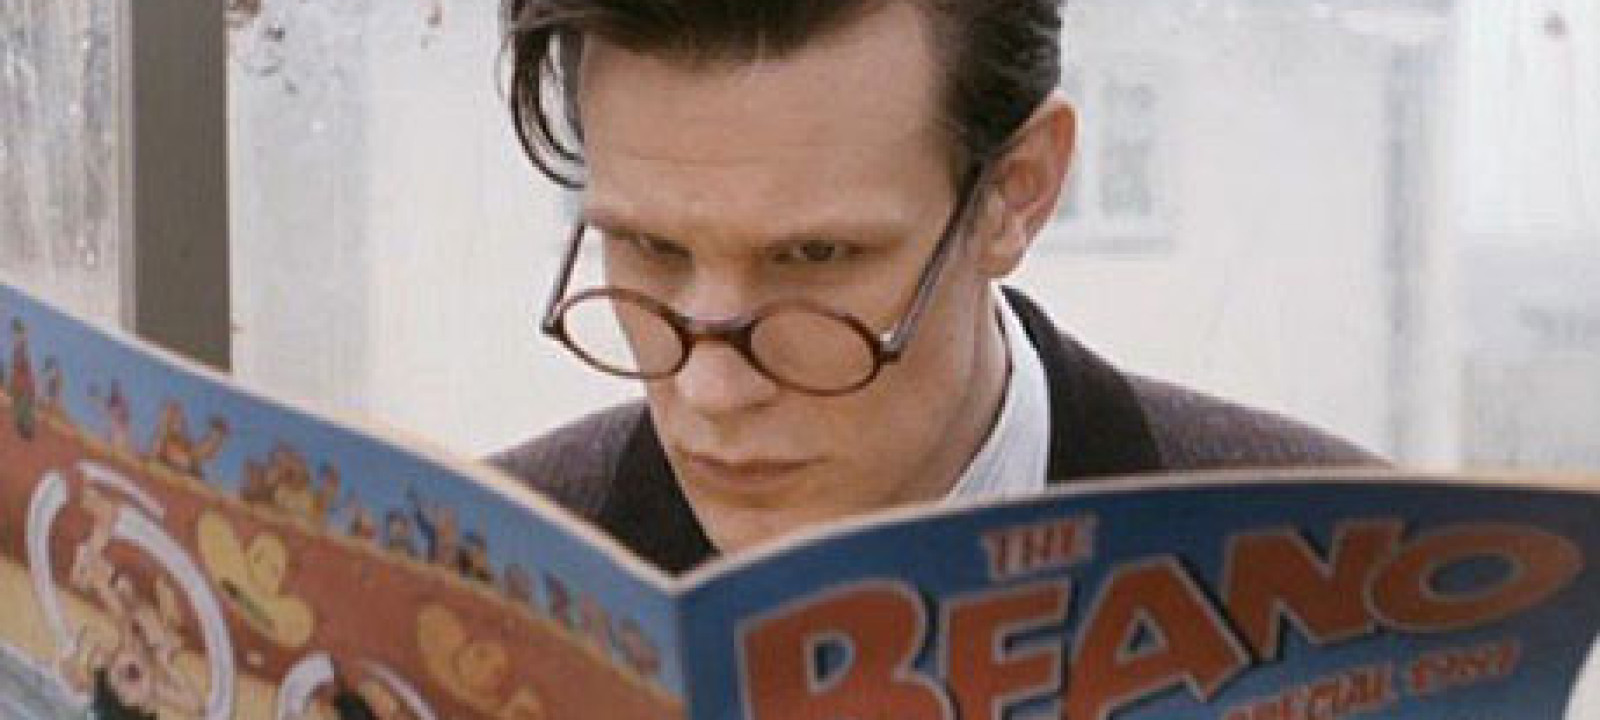 Doctor Who Beano